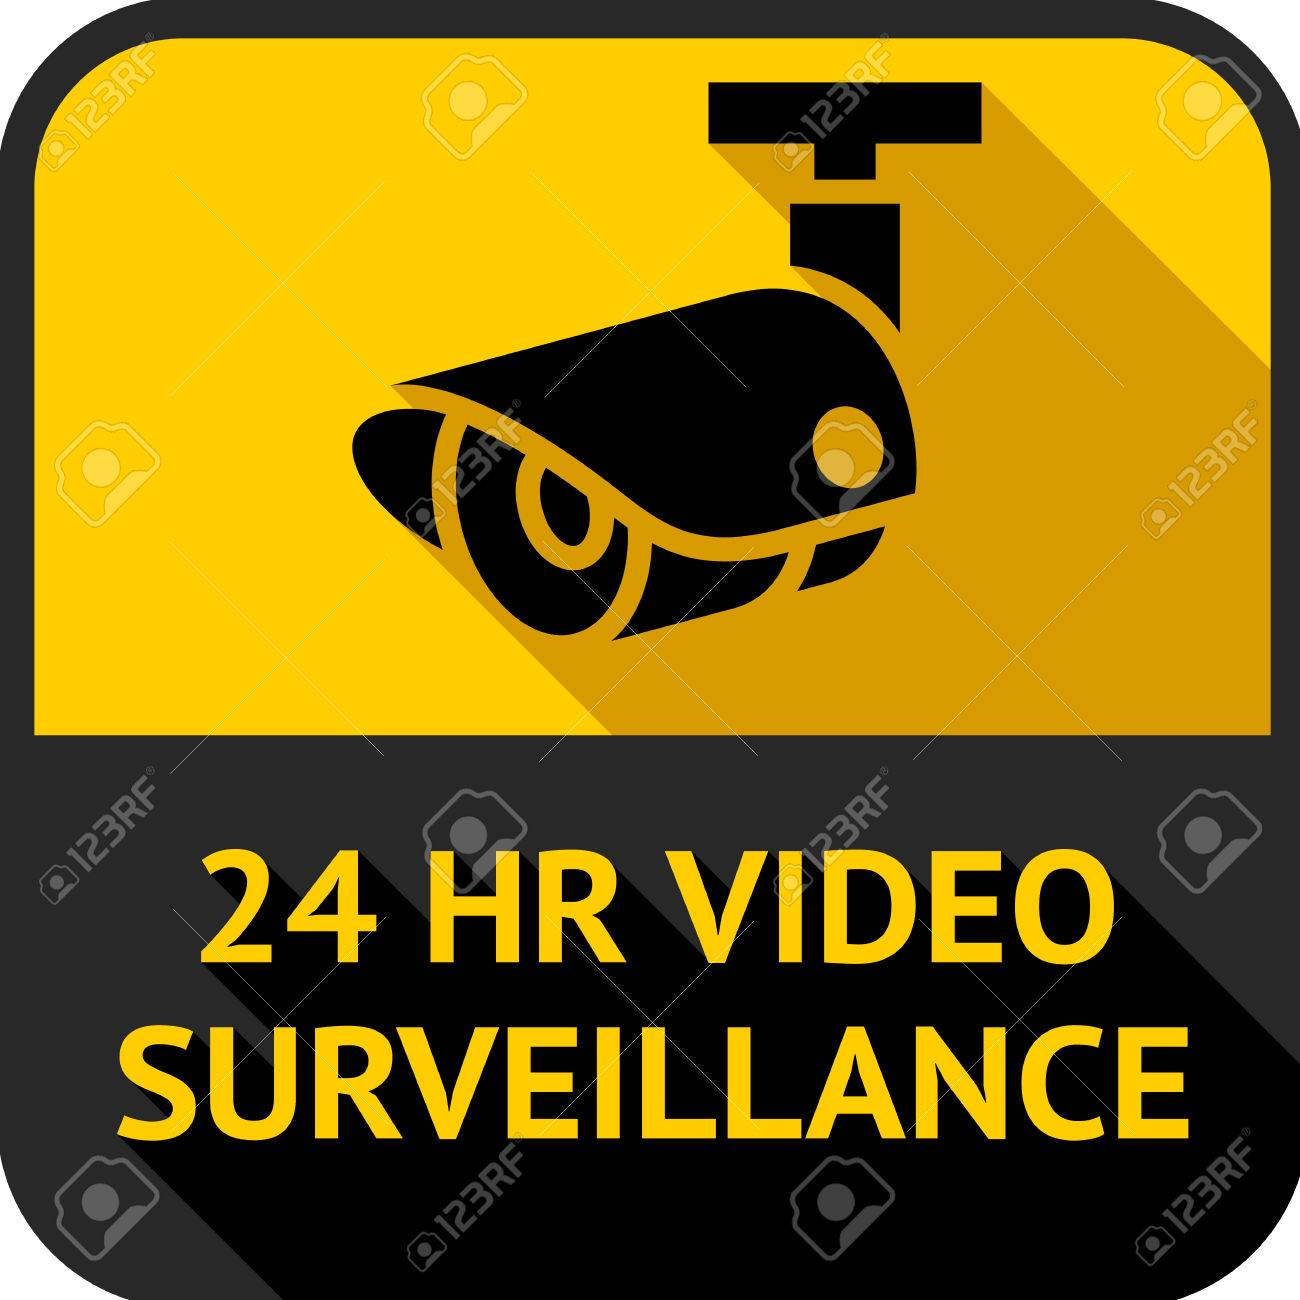 Video surveillance, set square stickers, vector illustration - 33383710